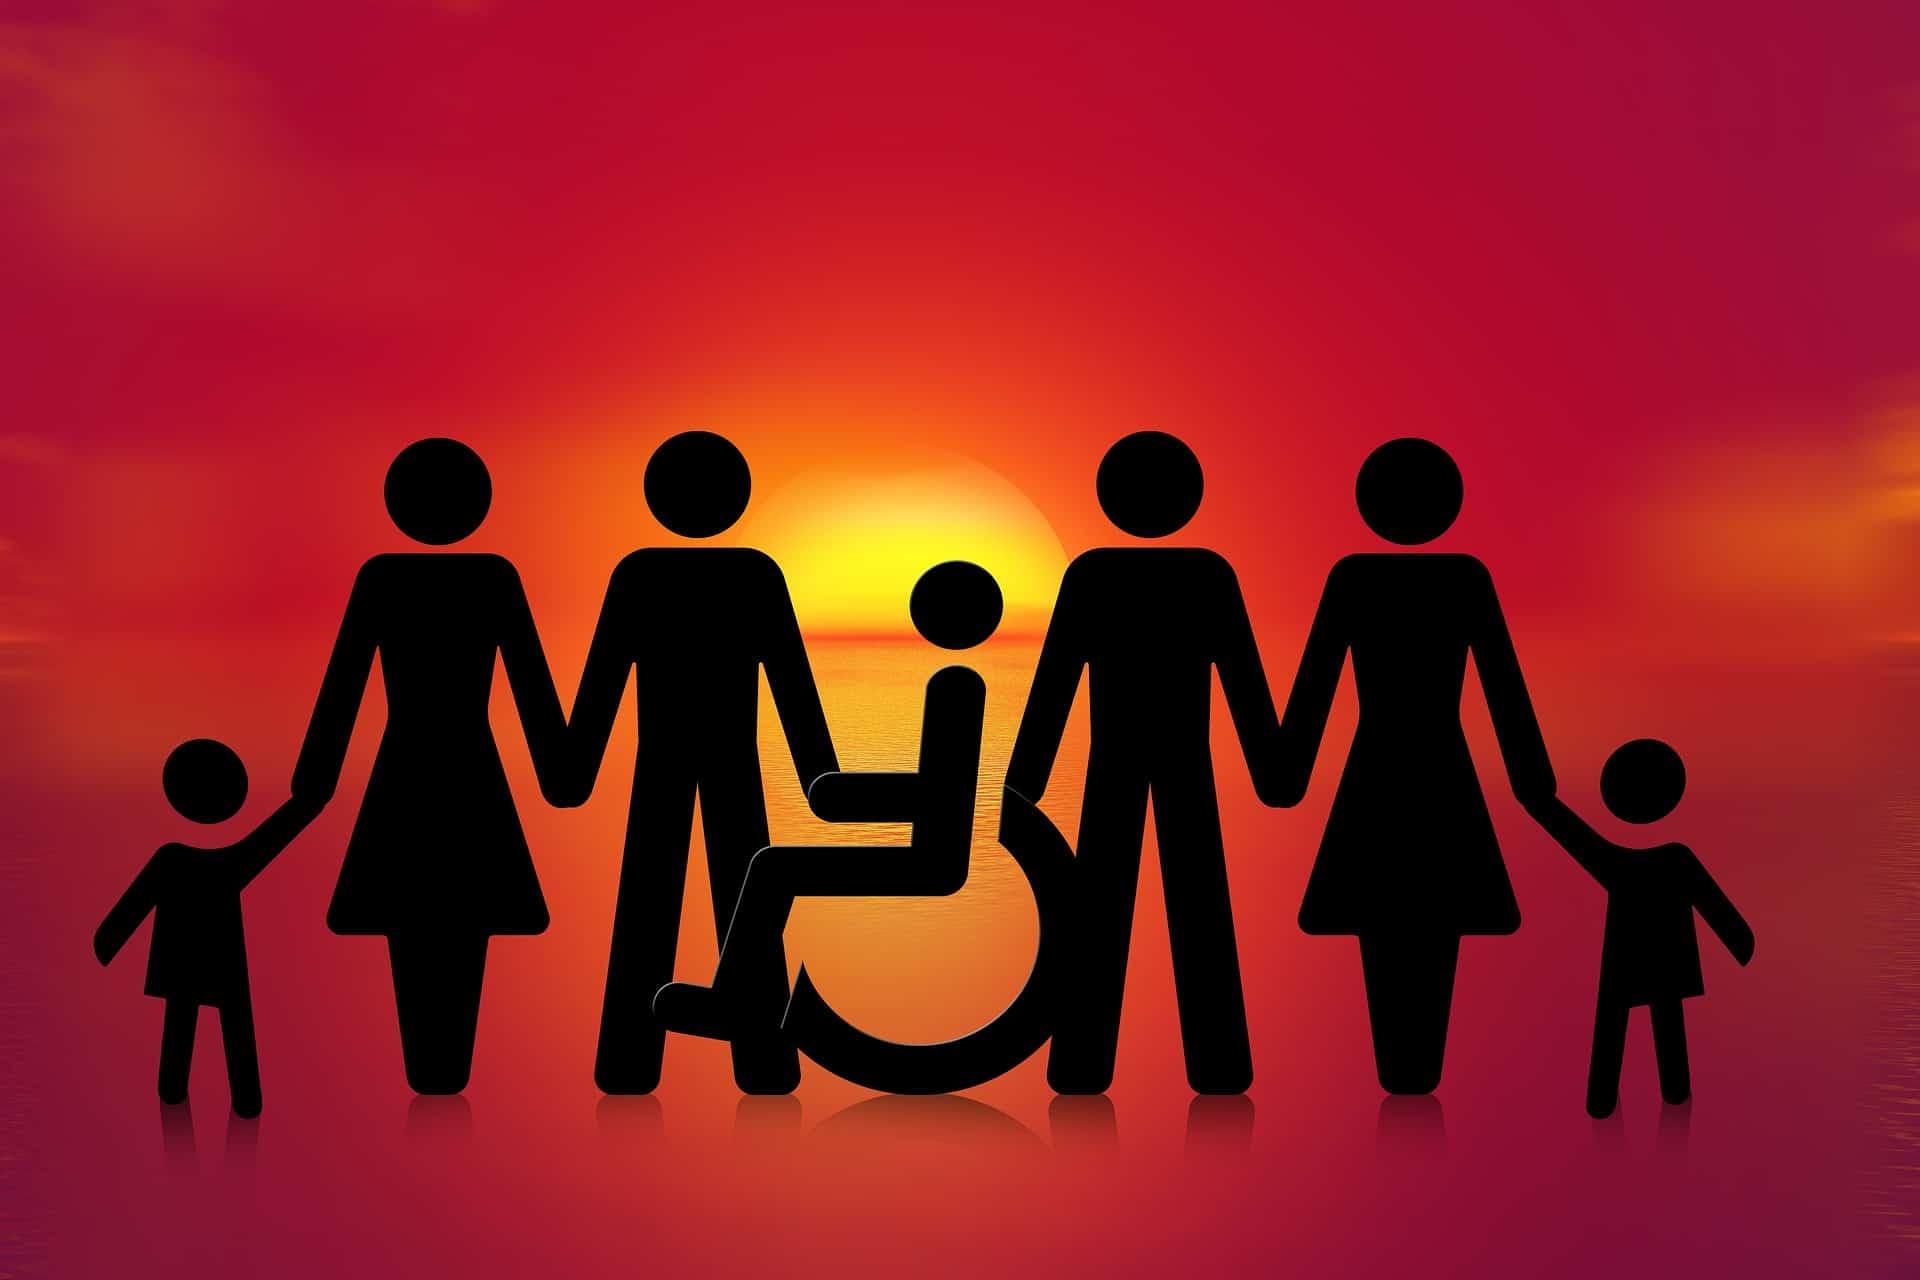 inclusion-2731339_1920.jpg